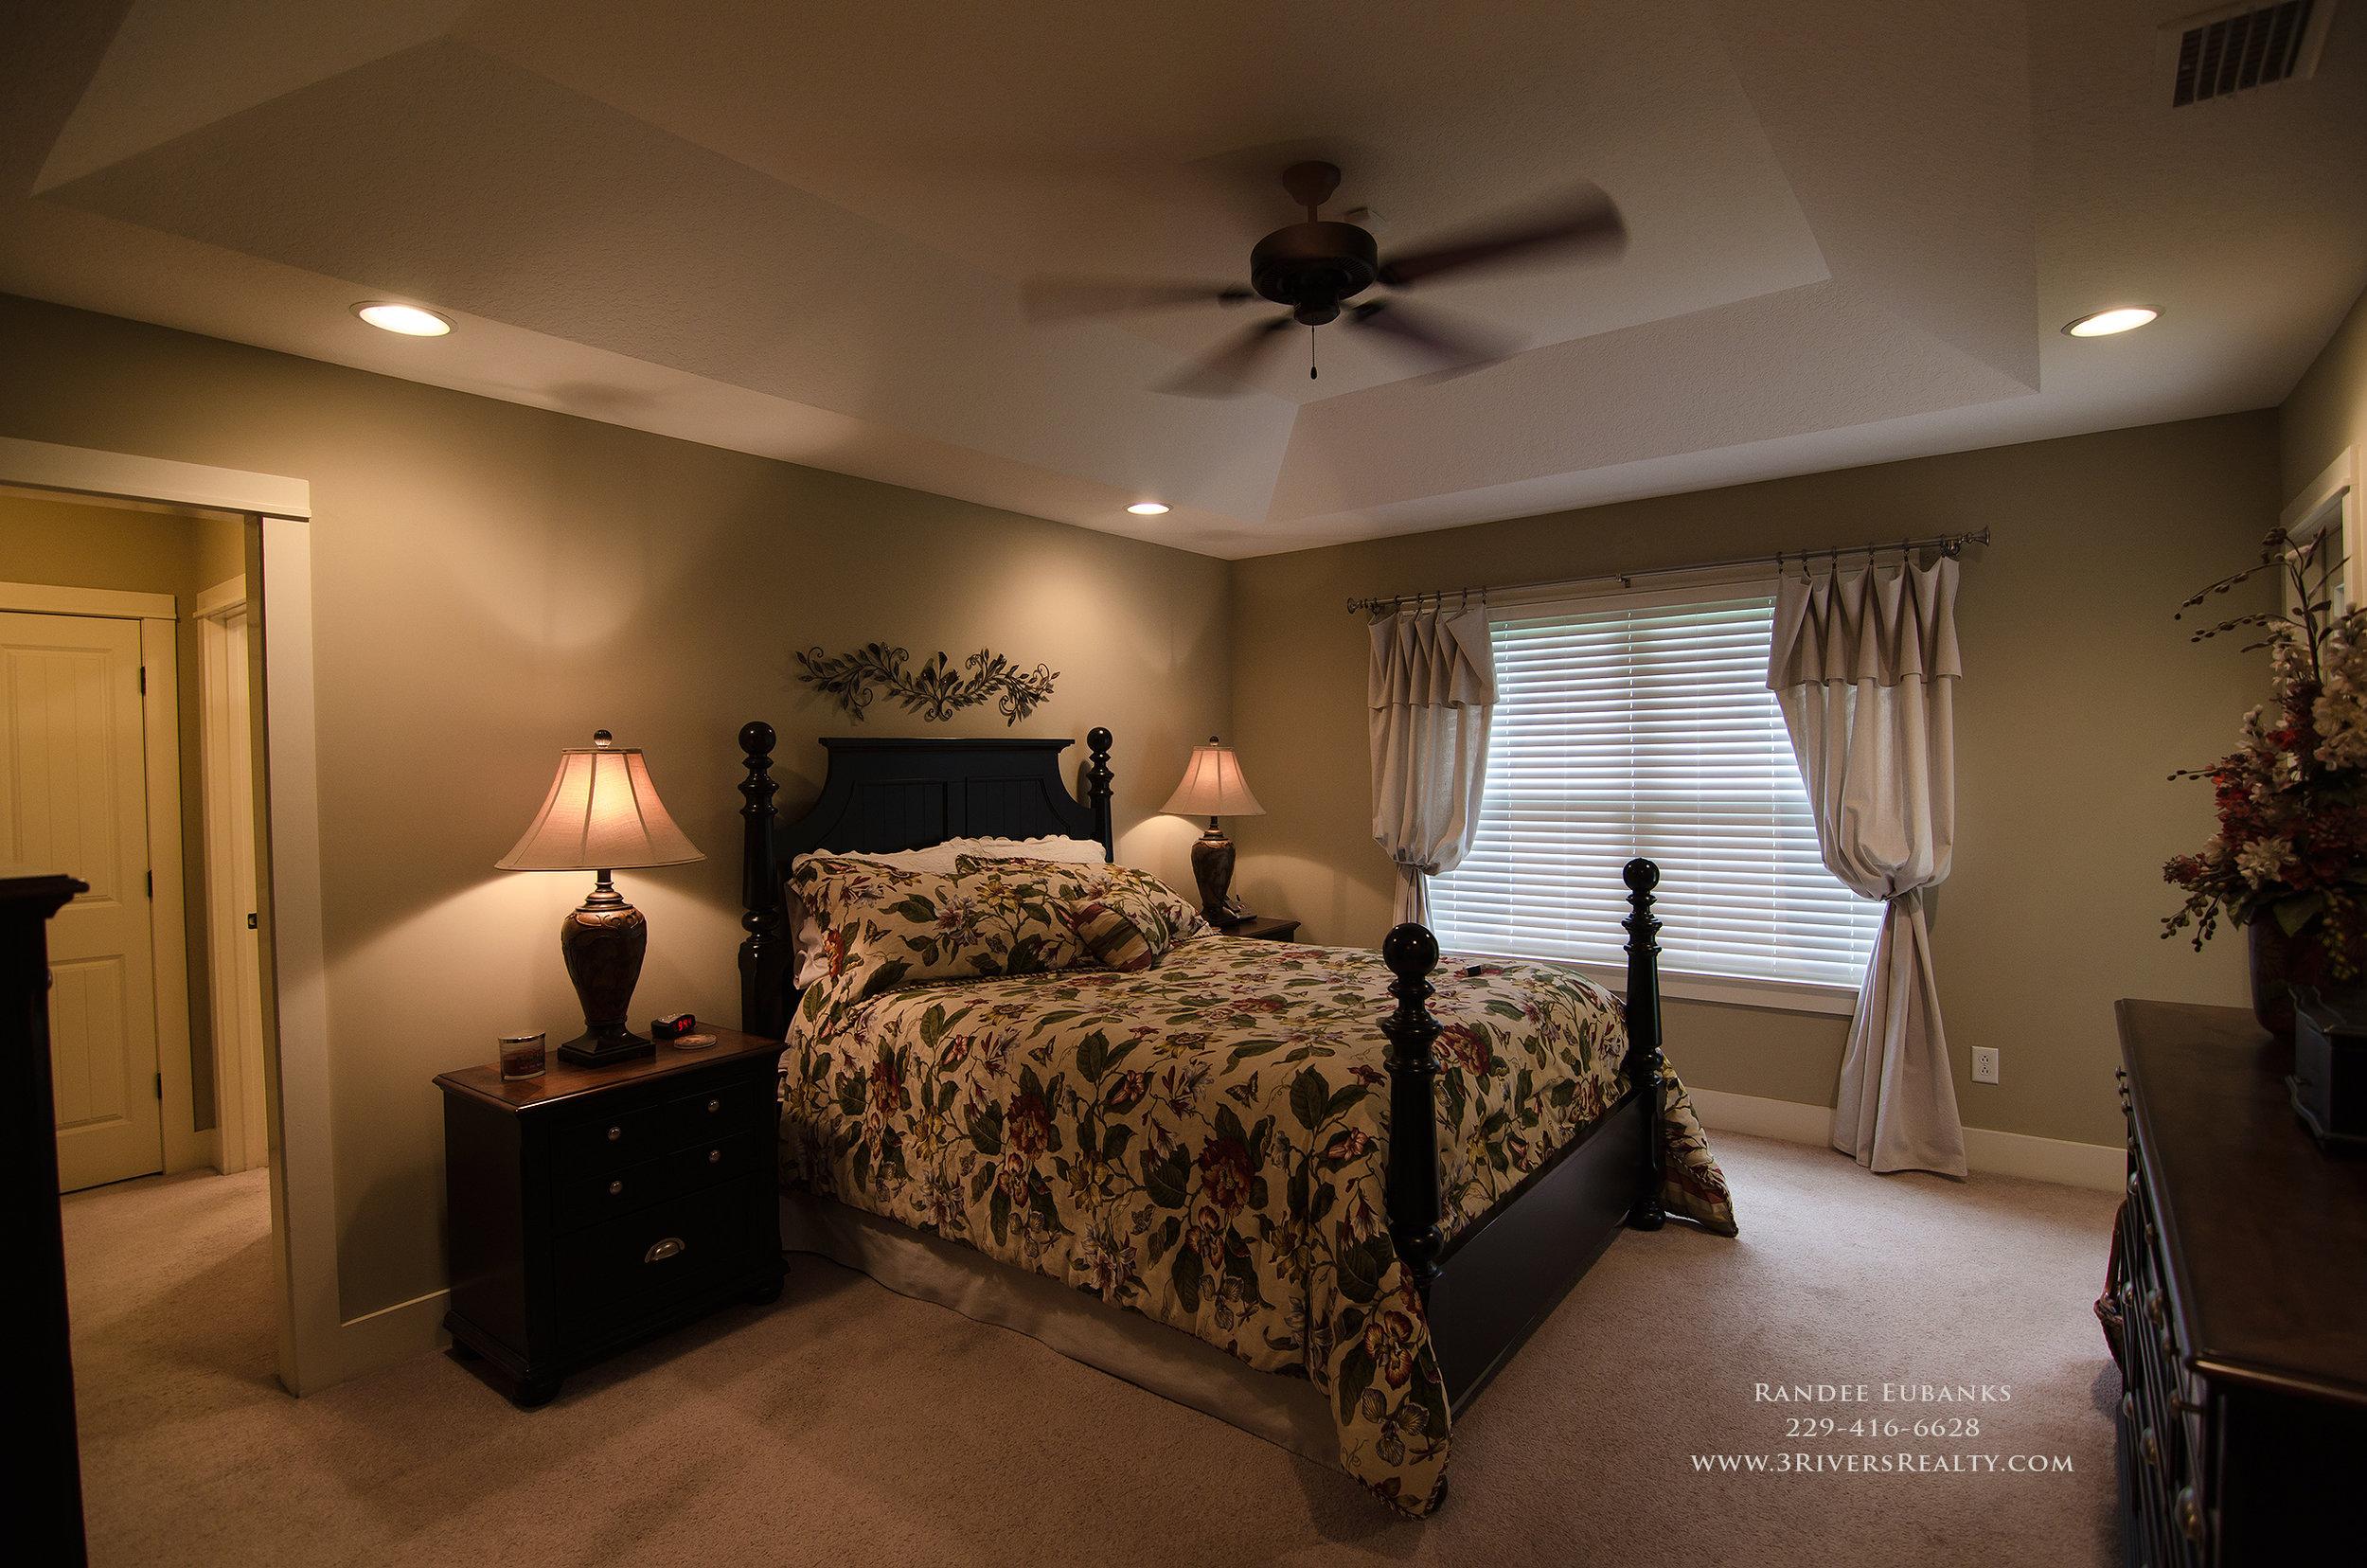 3riversrealty_bainbridge-georgia-home-for-sale_3-bed-2-bath_outdoor-fireplace_three-rivers-realty_mills-brock_Taurus-USA_-pool_back-porch-bedroom1 - Copy.jpg